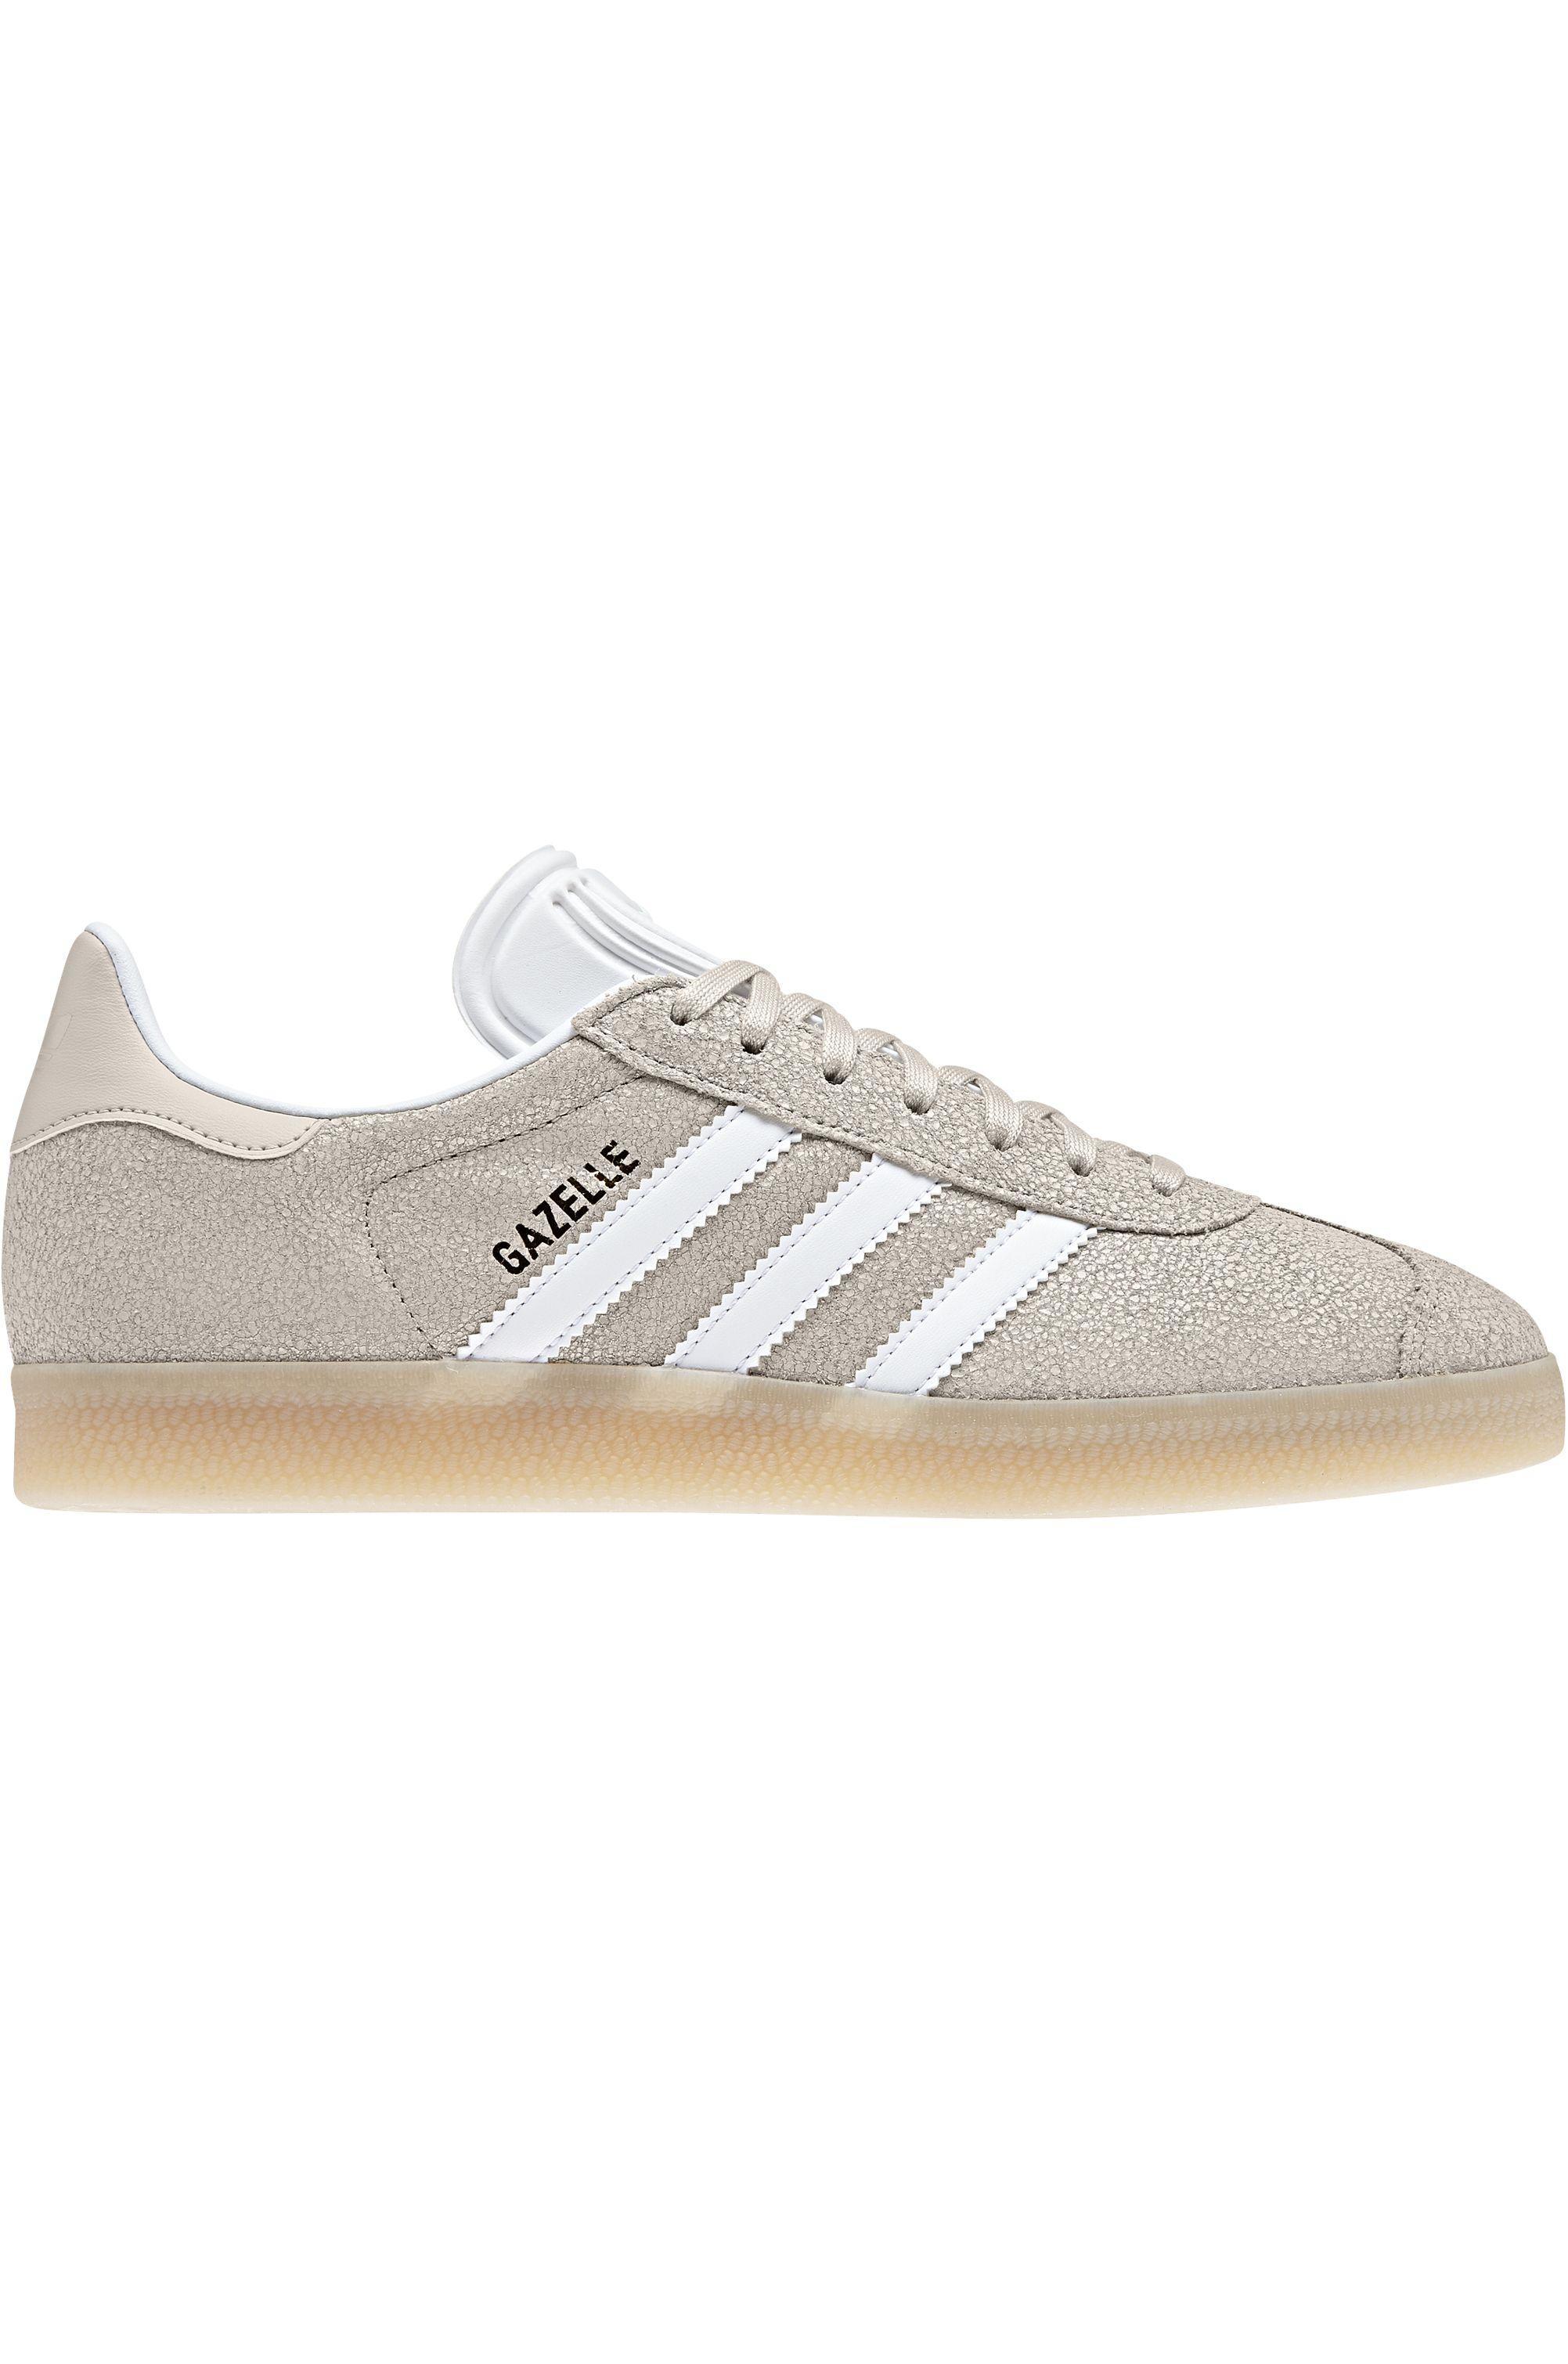 Tenis Adidas GAZELLE Clear BrownFtwr WhiteEcru Tint S18